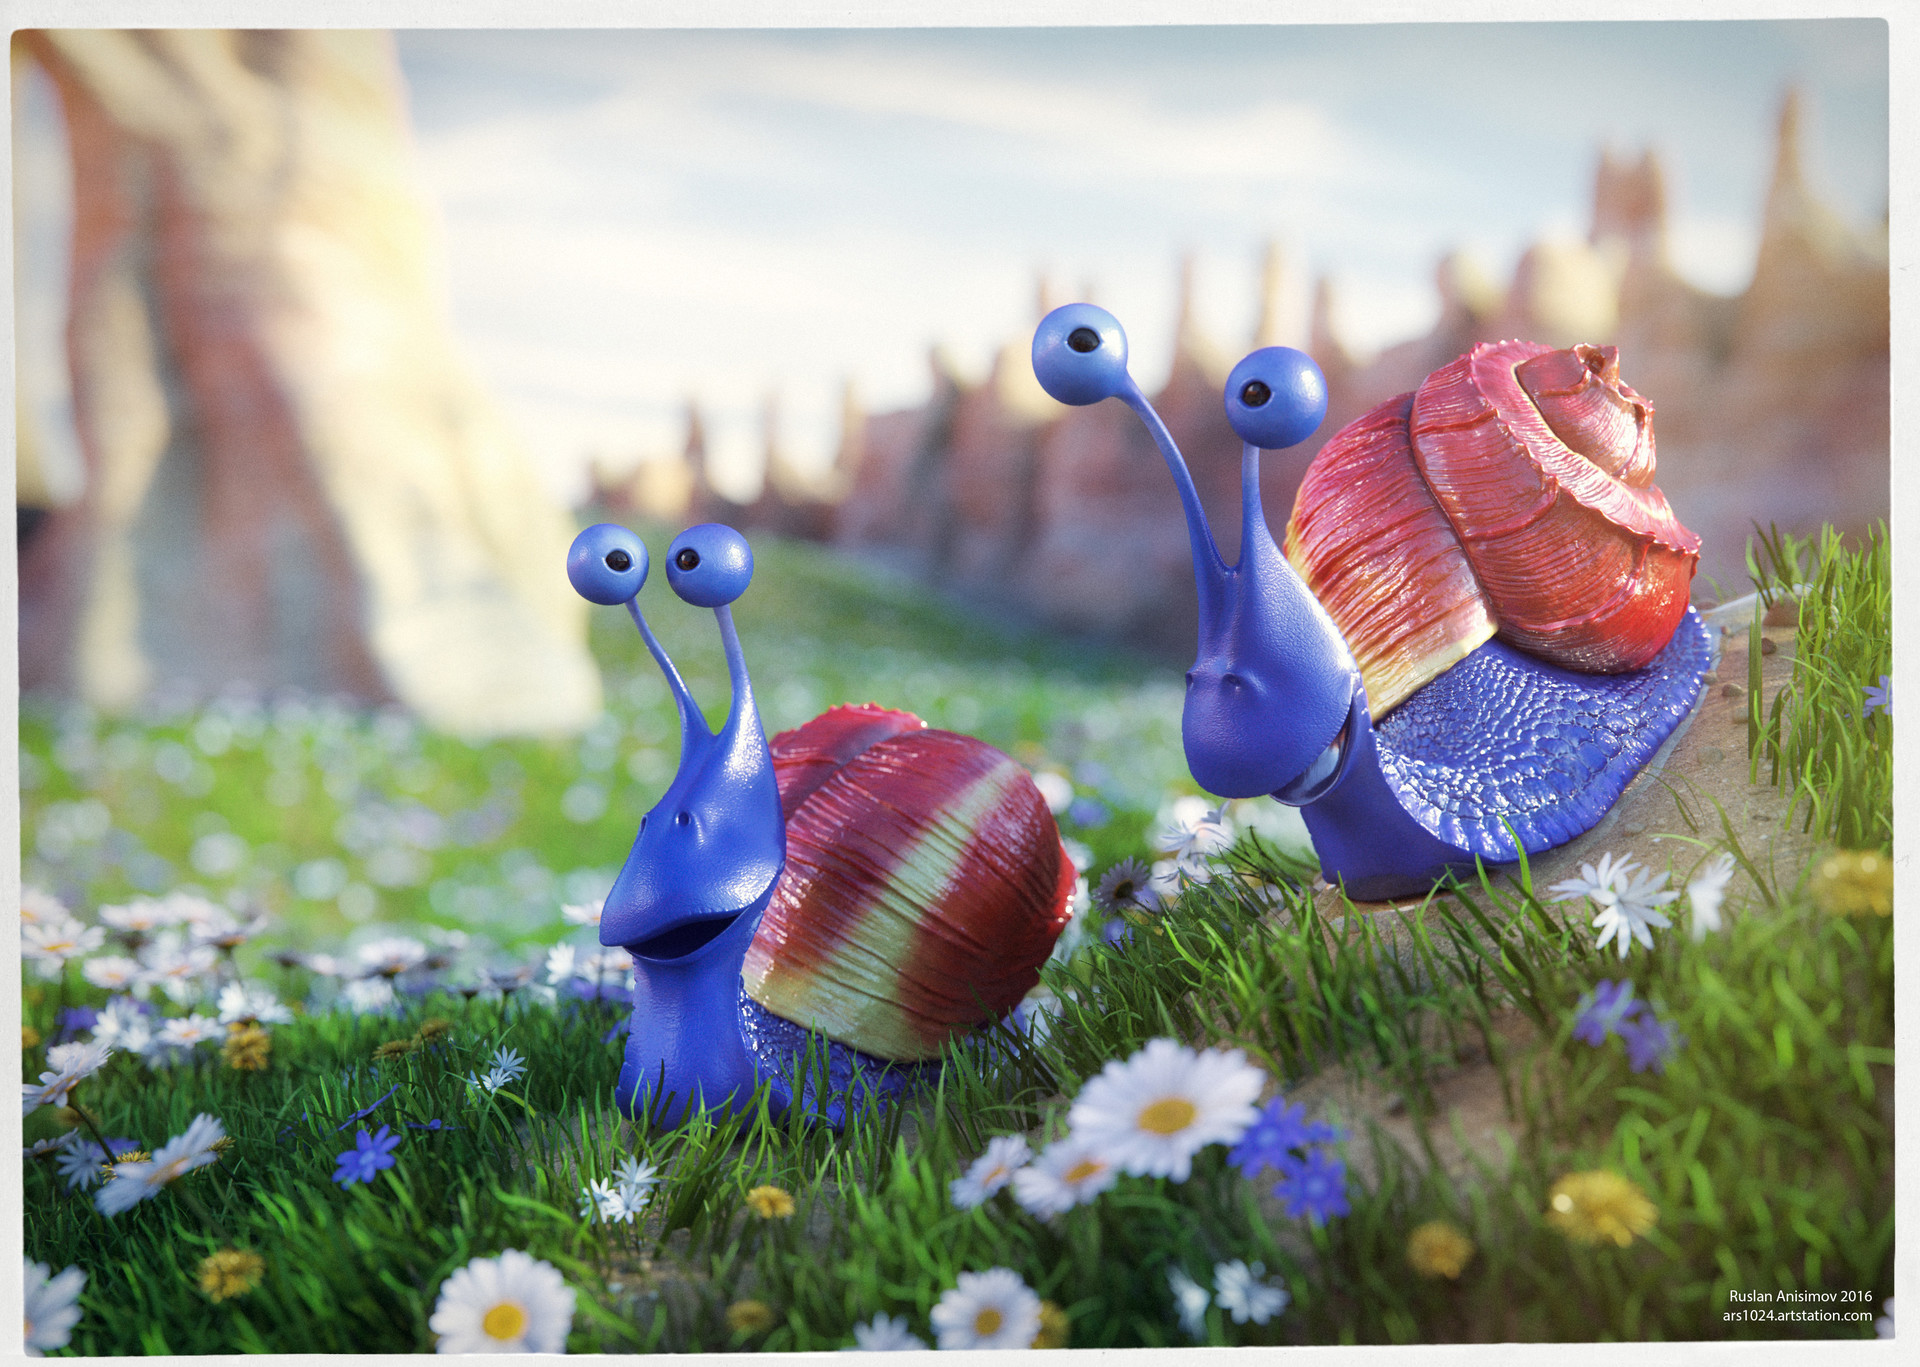 Ruslan anisimov snailspic